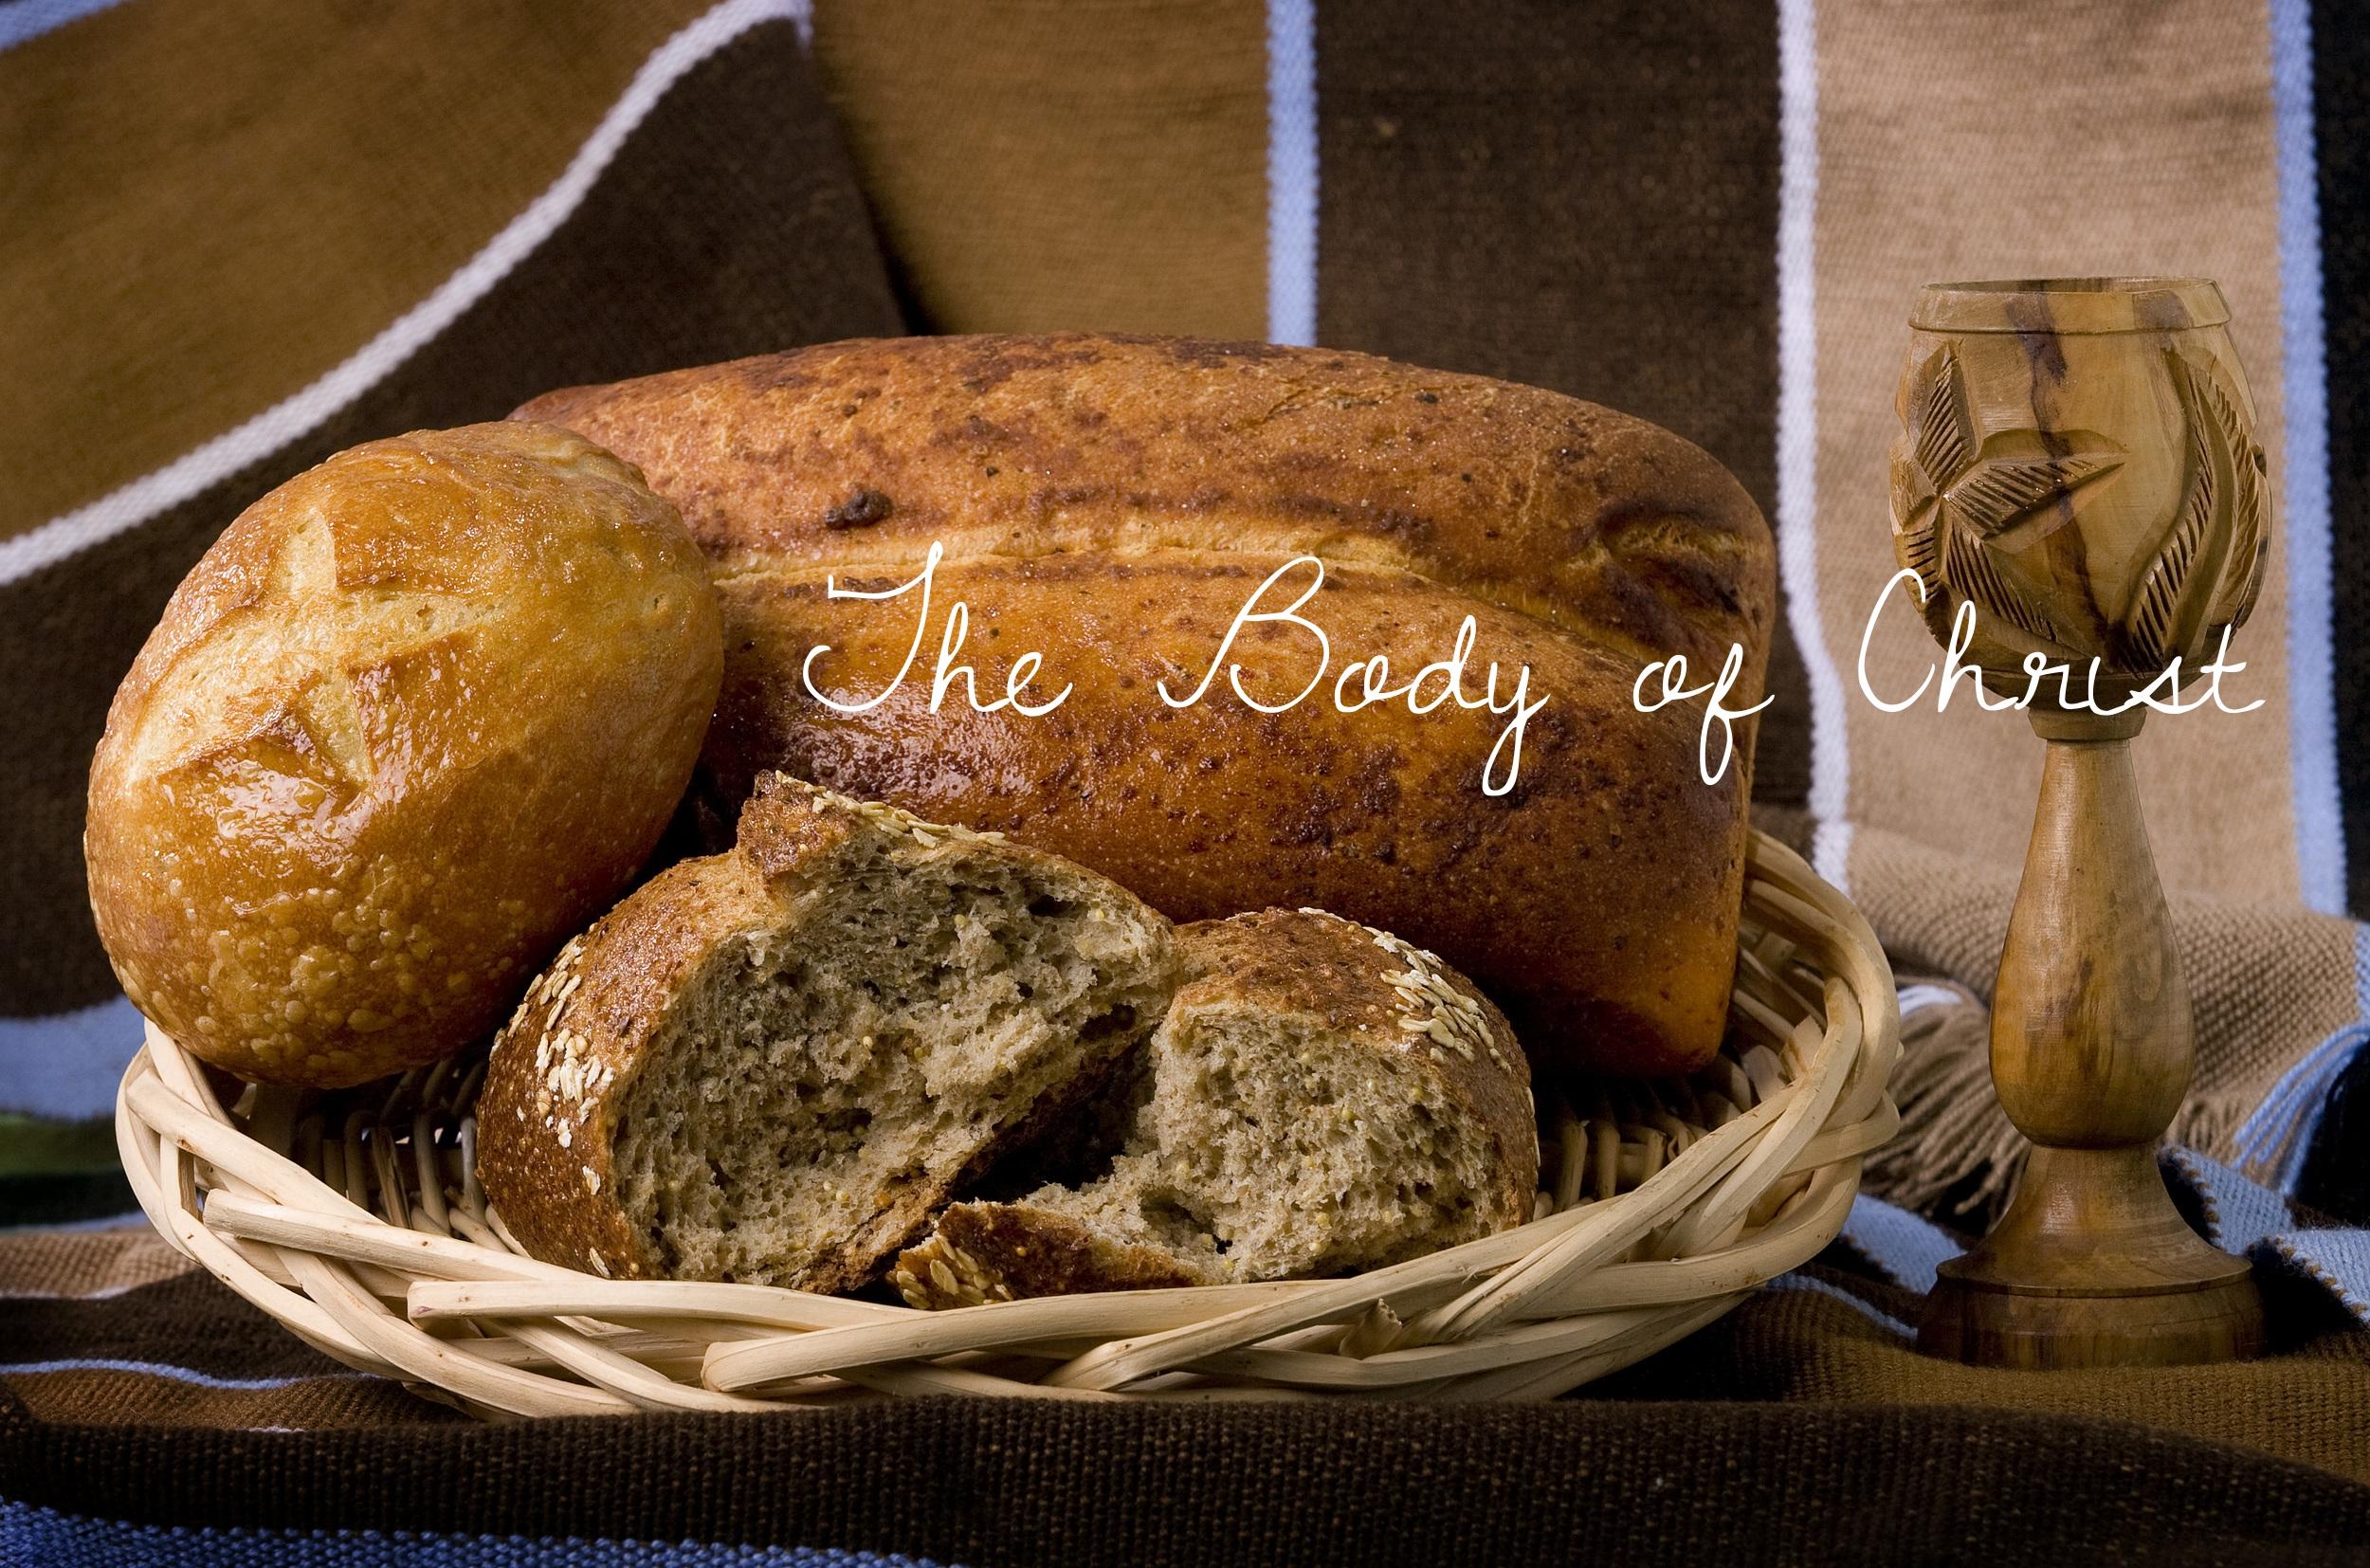 communion-bread-online-discussion.jpg